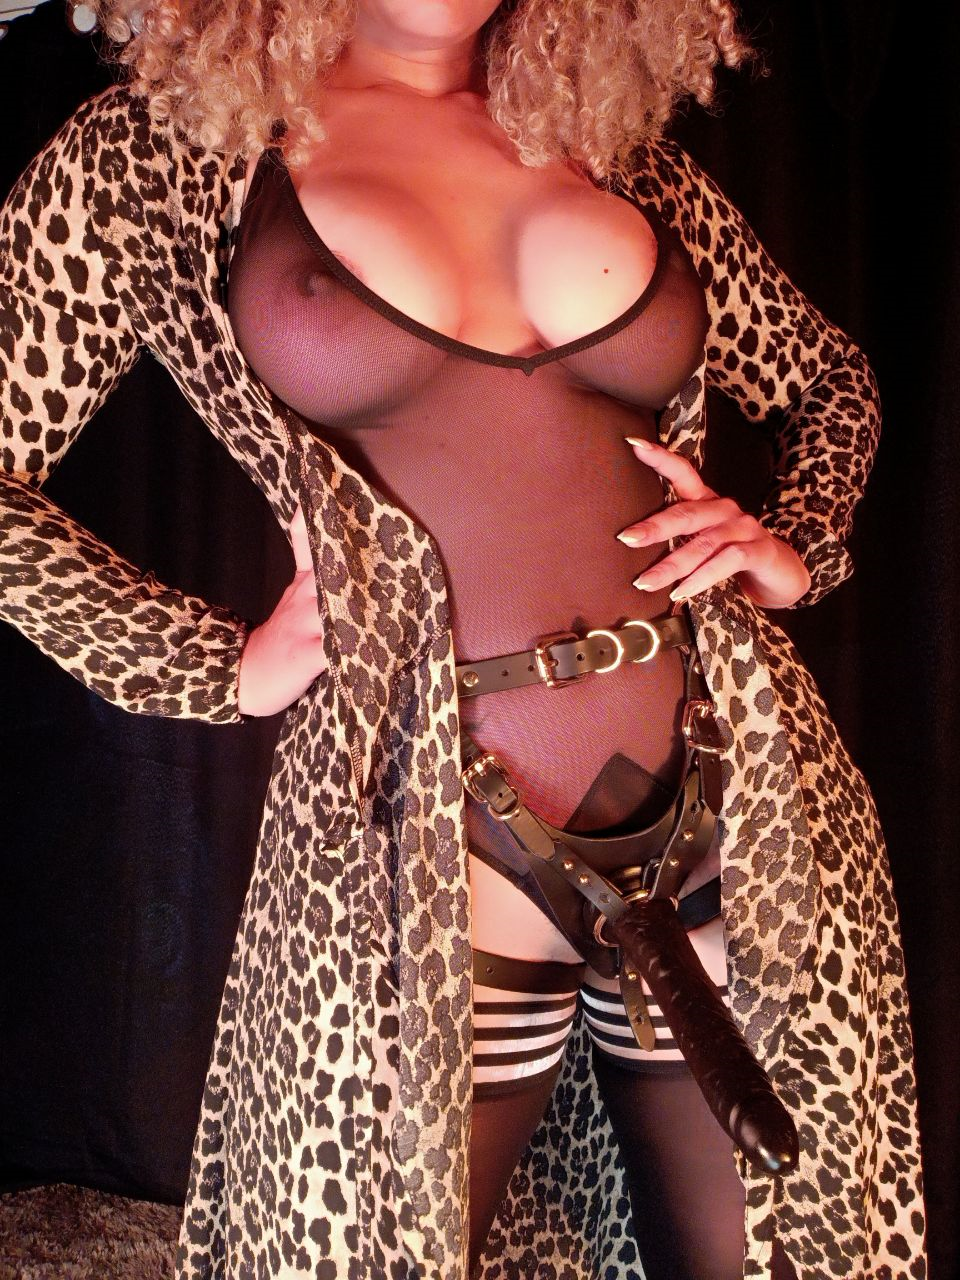 Mistress Sophie OnlyFans profiel